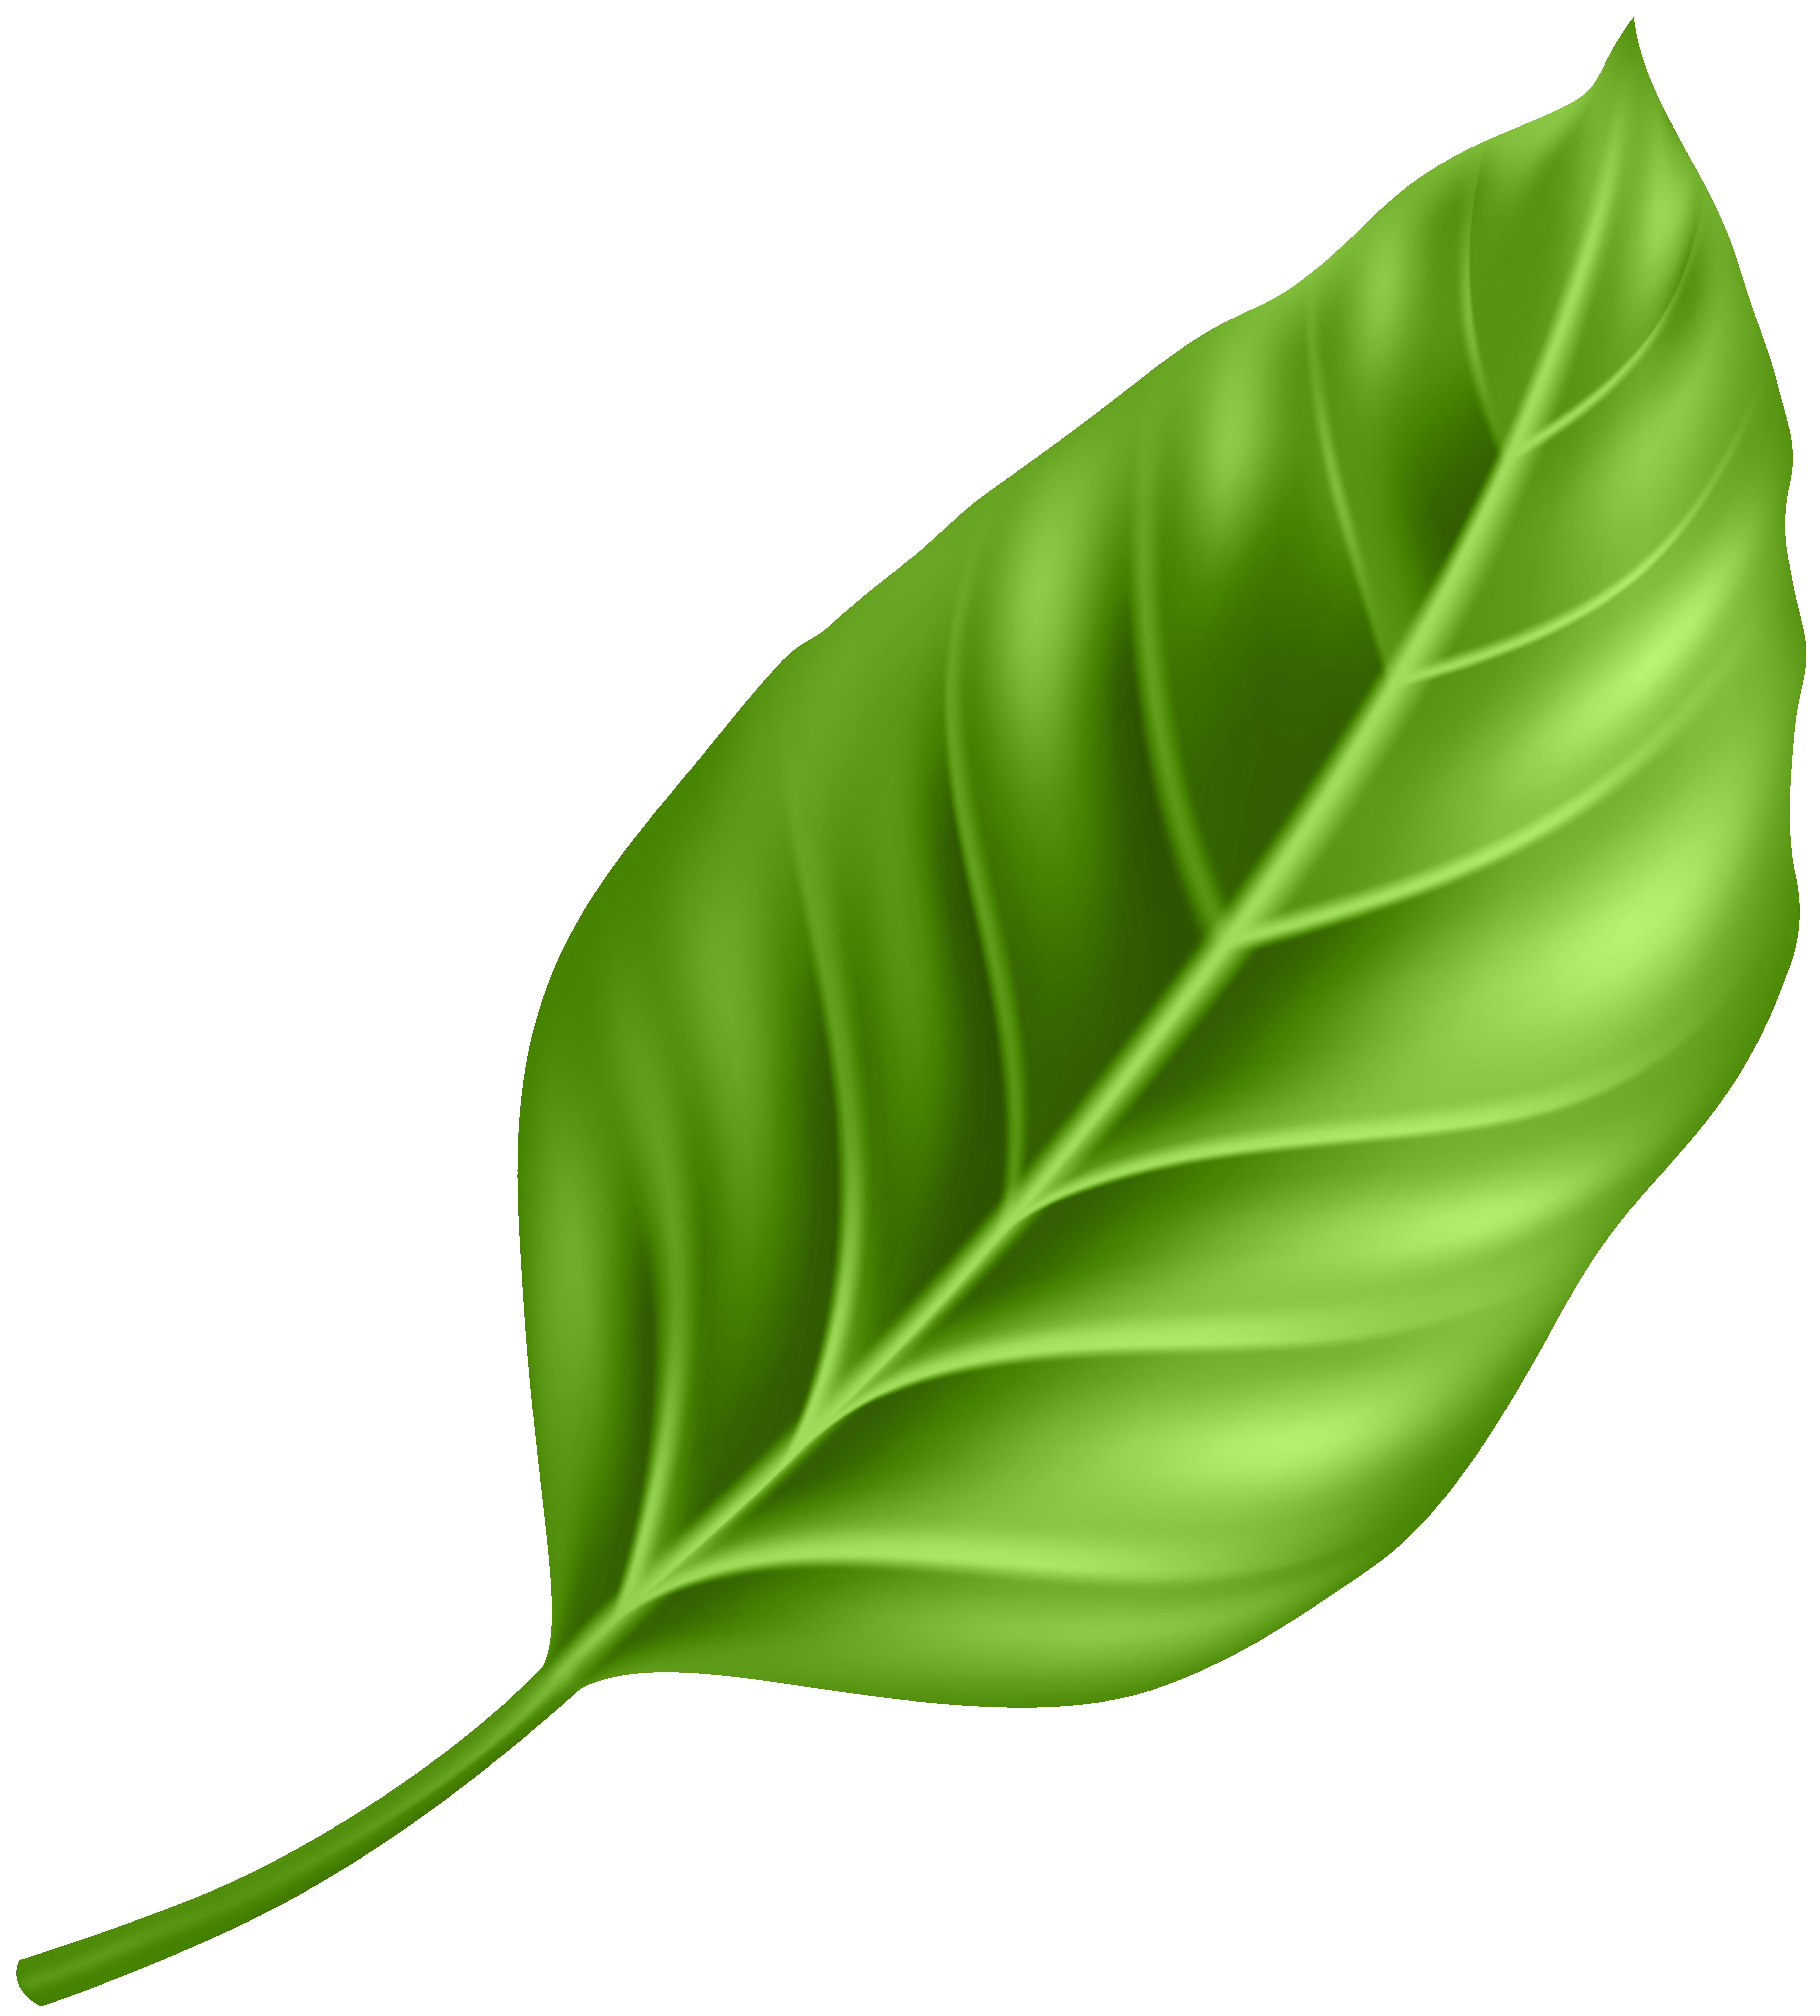 Leaf PNG Clipart.